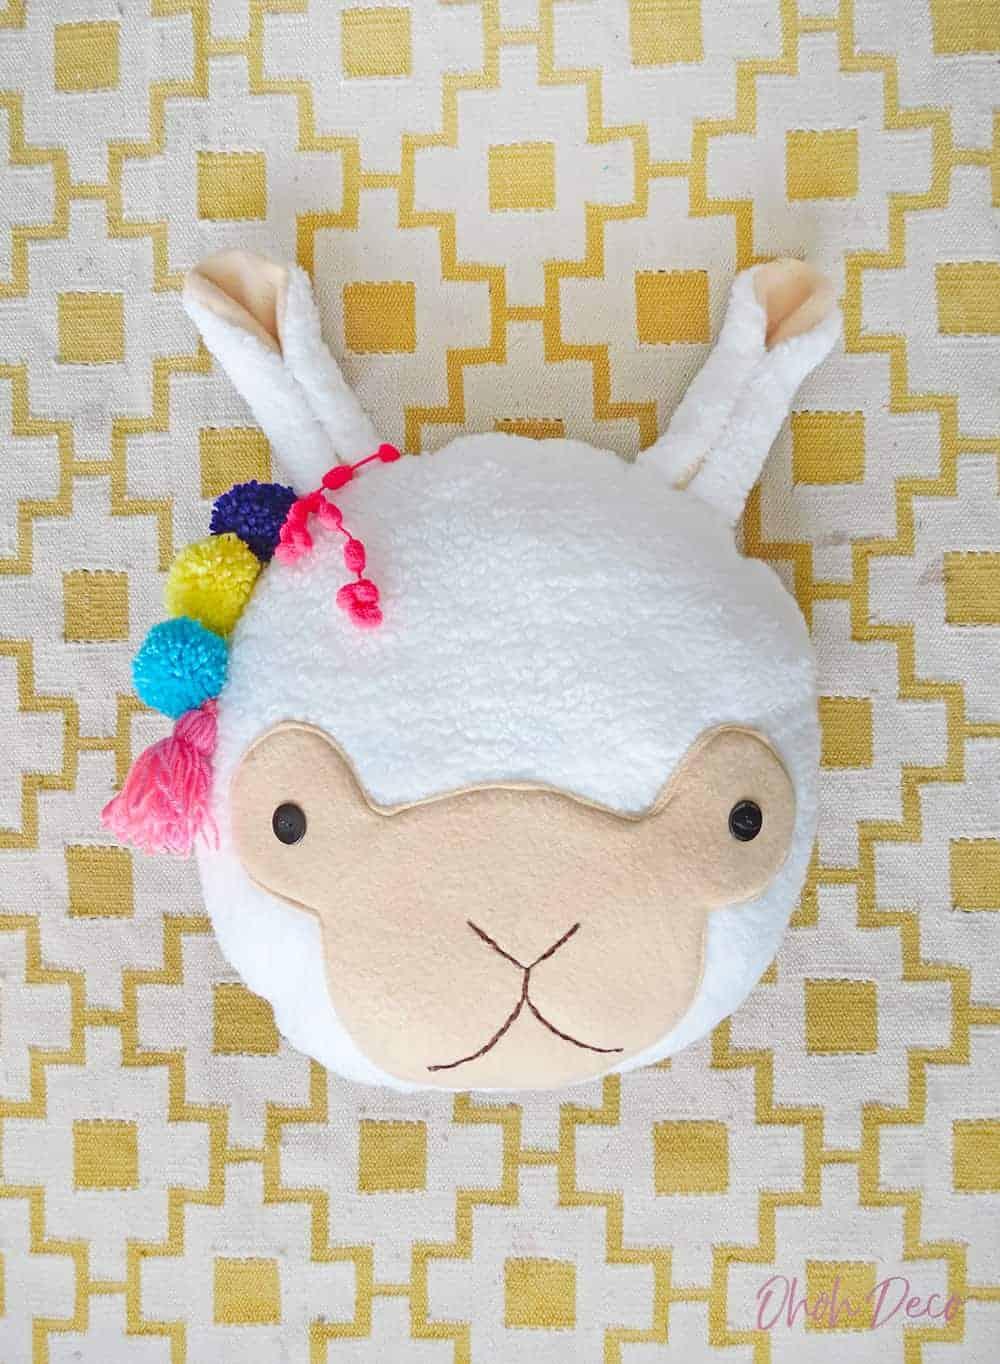 How to sew a Llama cushion